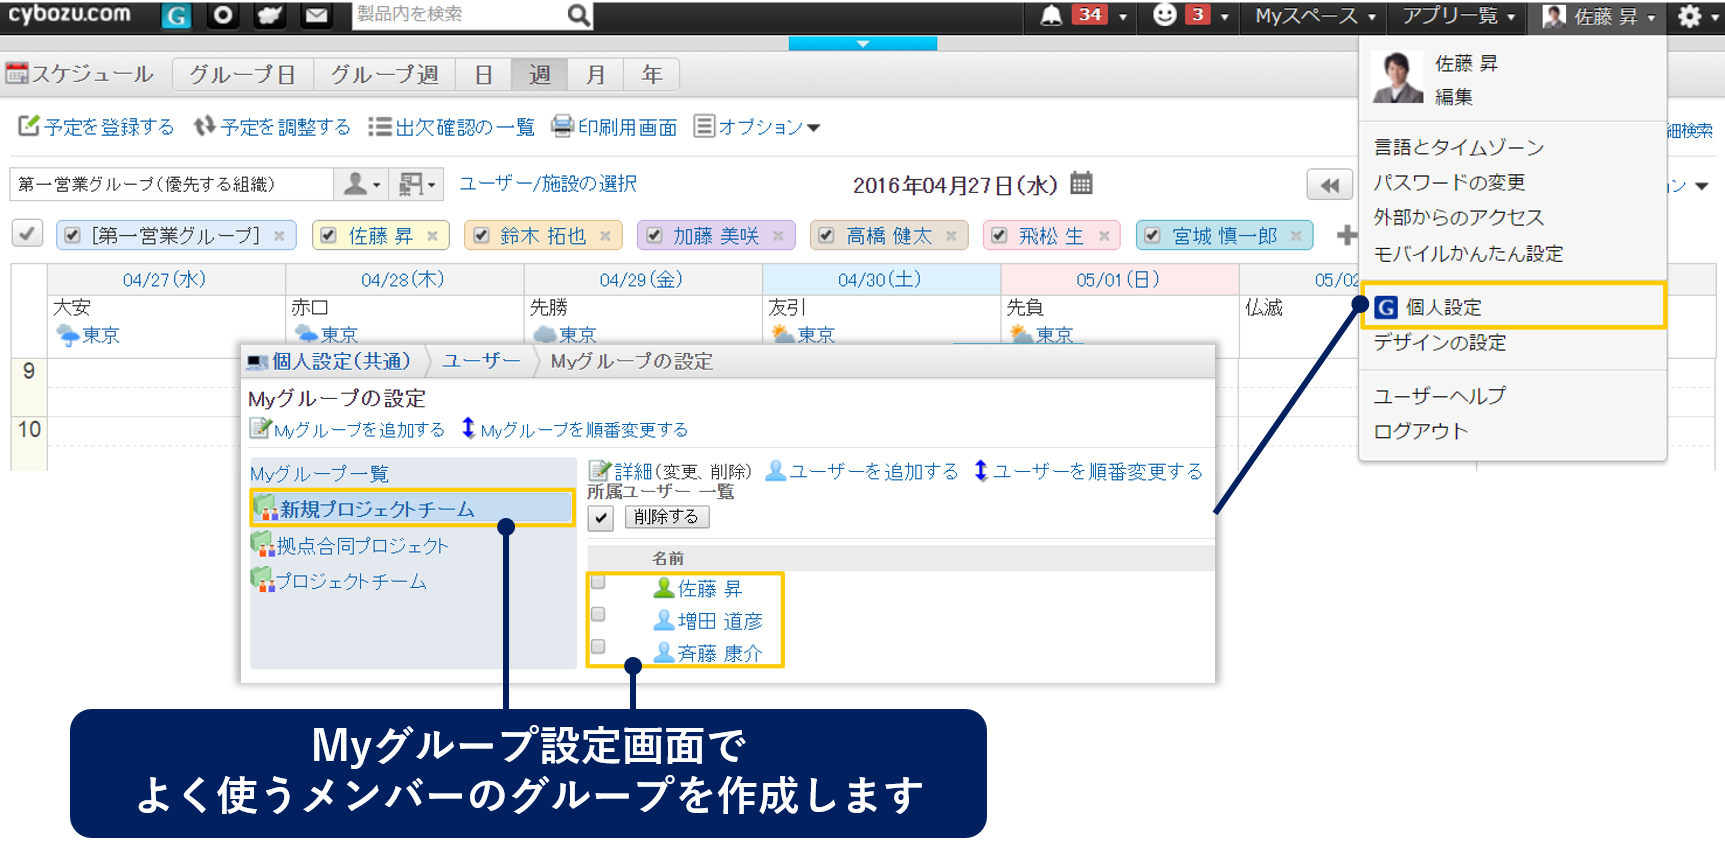 https://enterprise.cybozu.co.jp/2016/04/9e6cd1aa7a695aa422694ef0f38482a1d46b8123.png